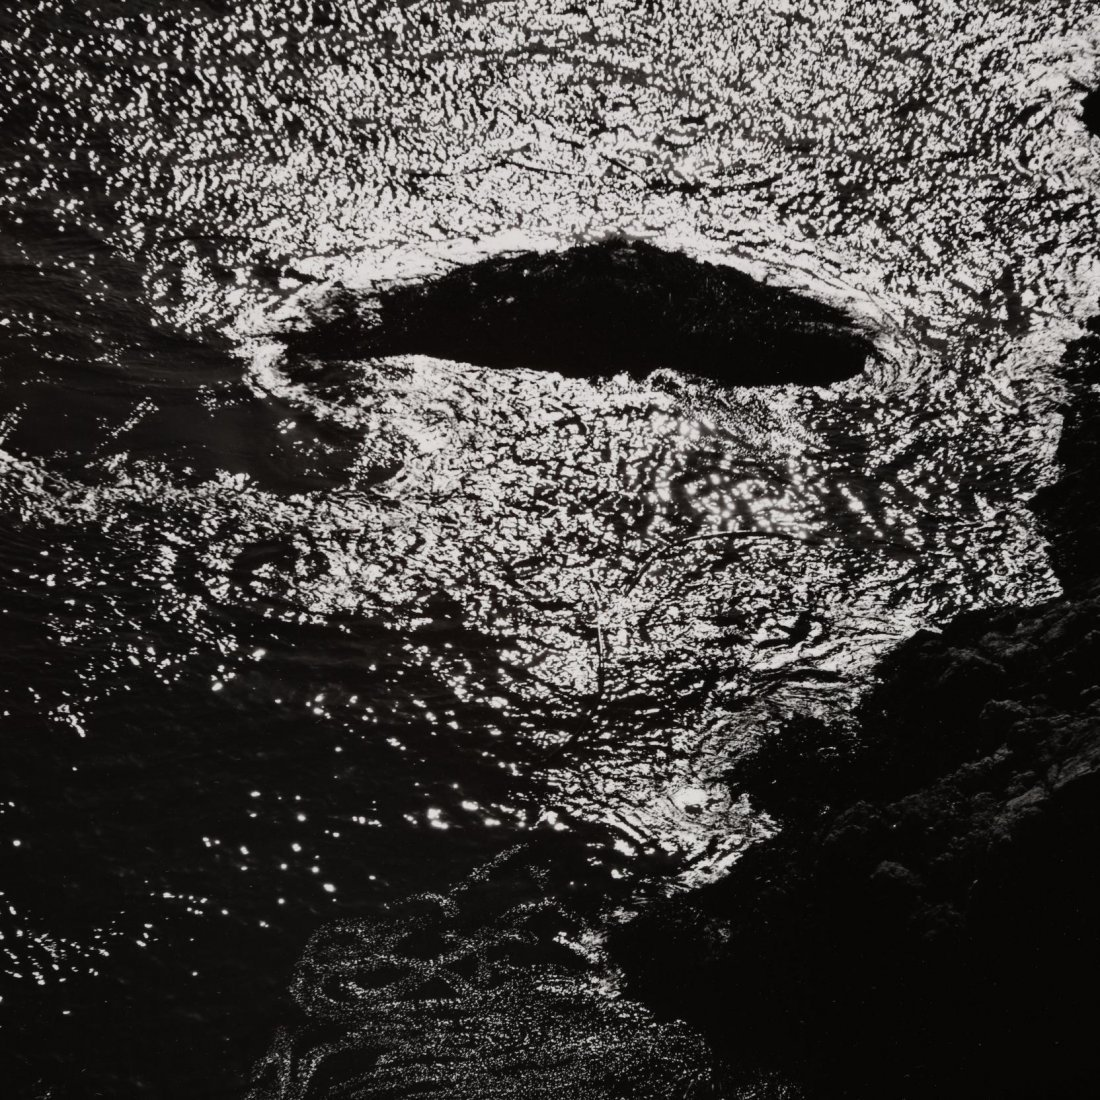 Edward Weston (American, 1886-1958),  China Cove, Point - 2